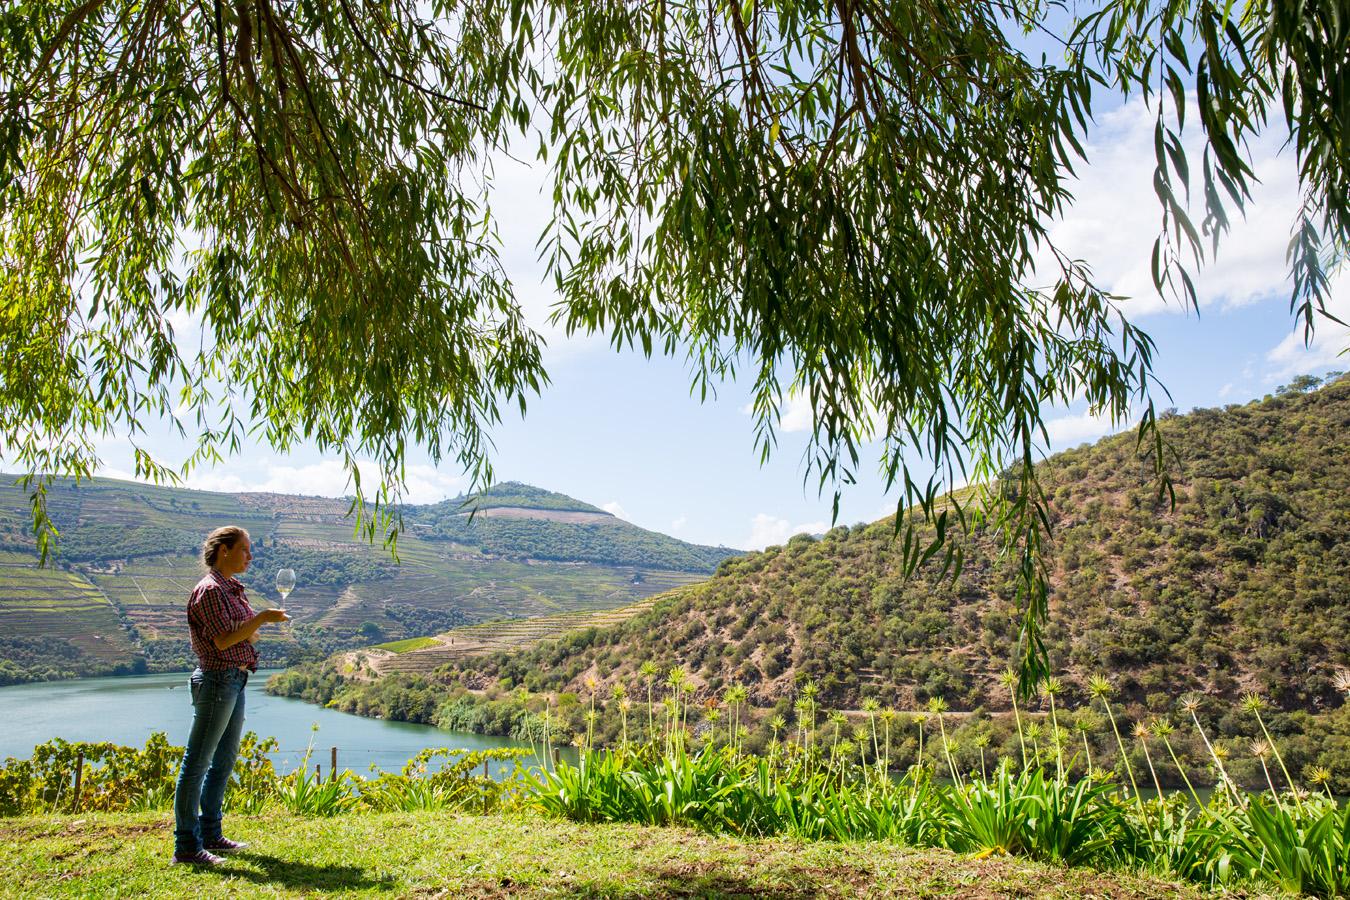 Quinta de Ventozelo – Casa do Laranjal